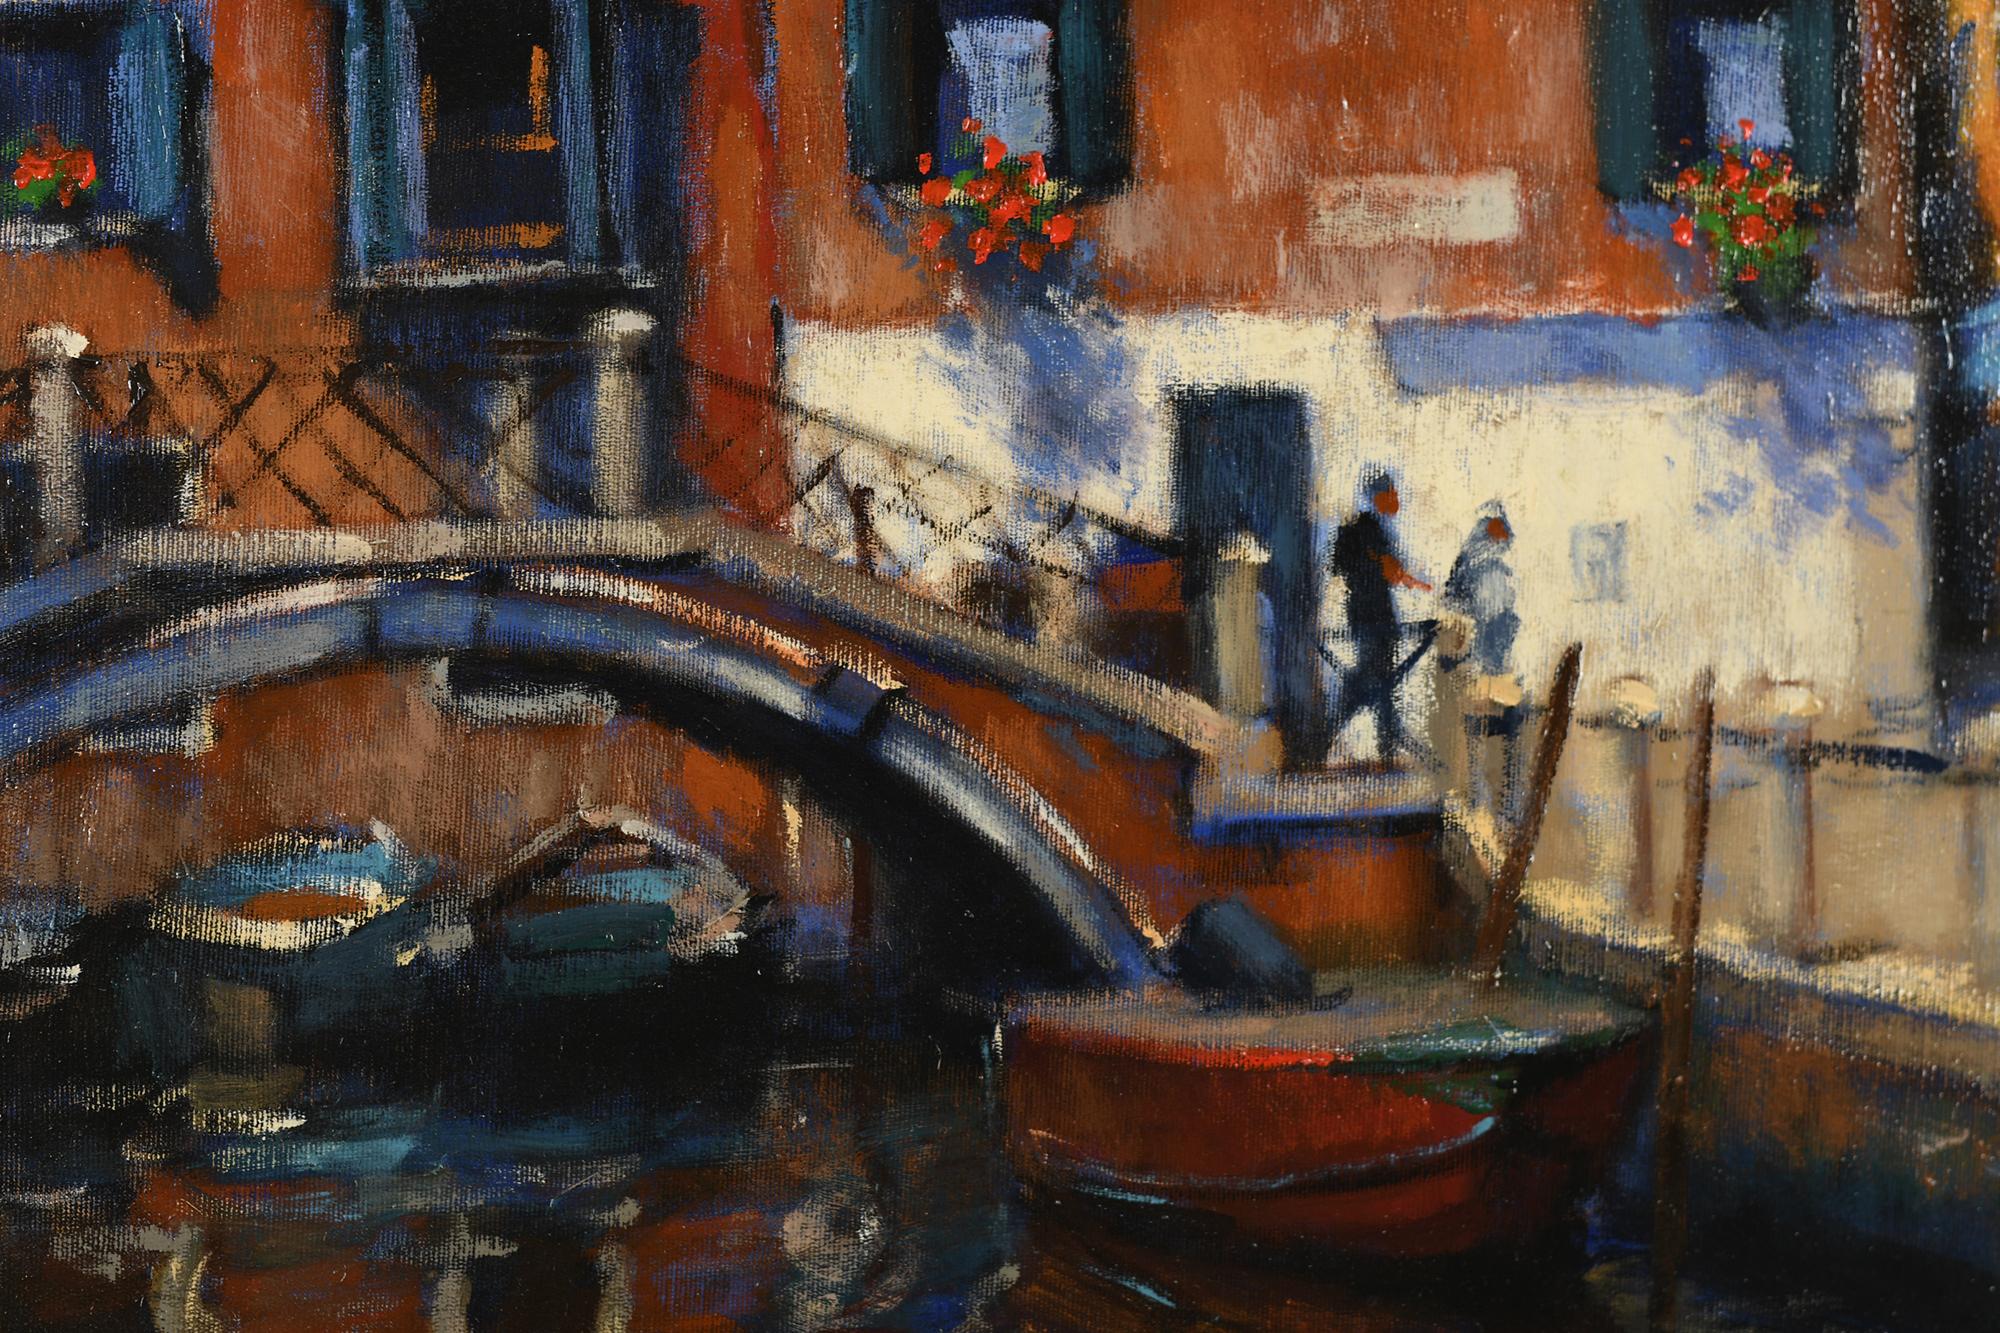 John Mackie original Painting - Image 6 of 6